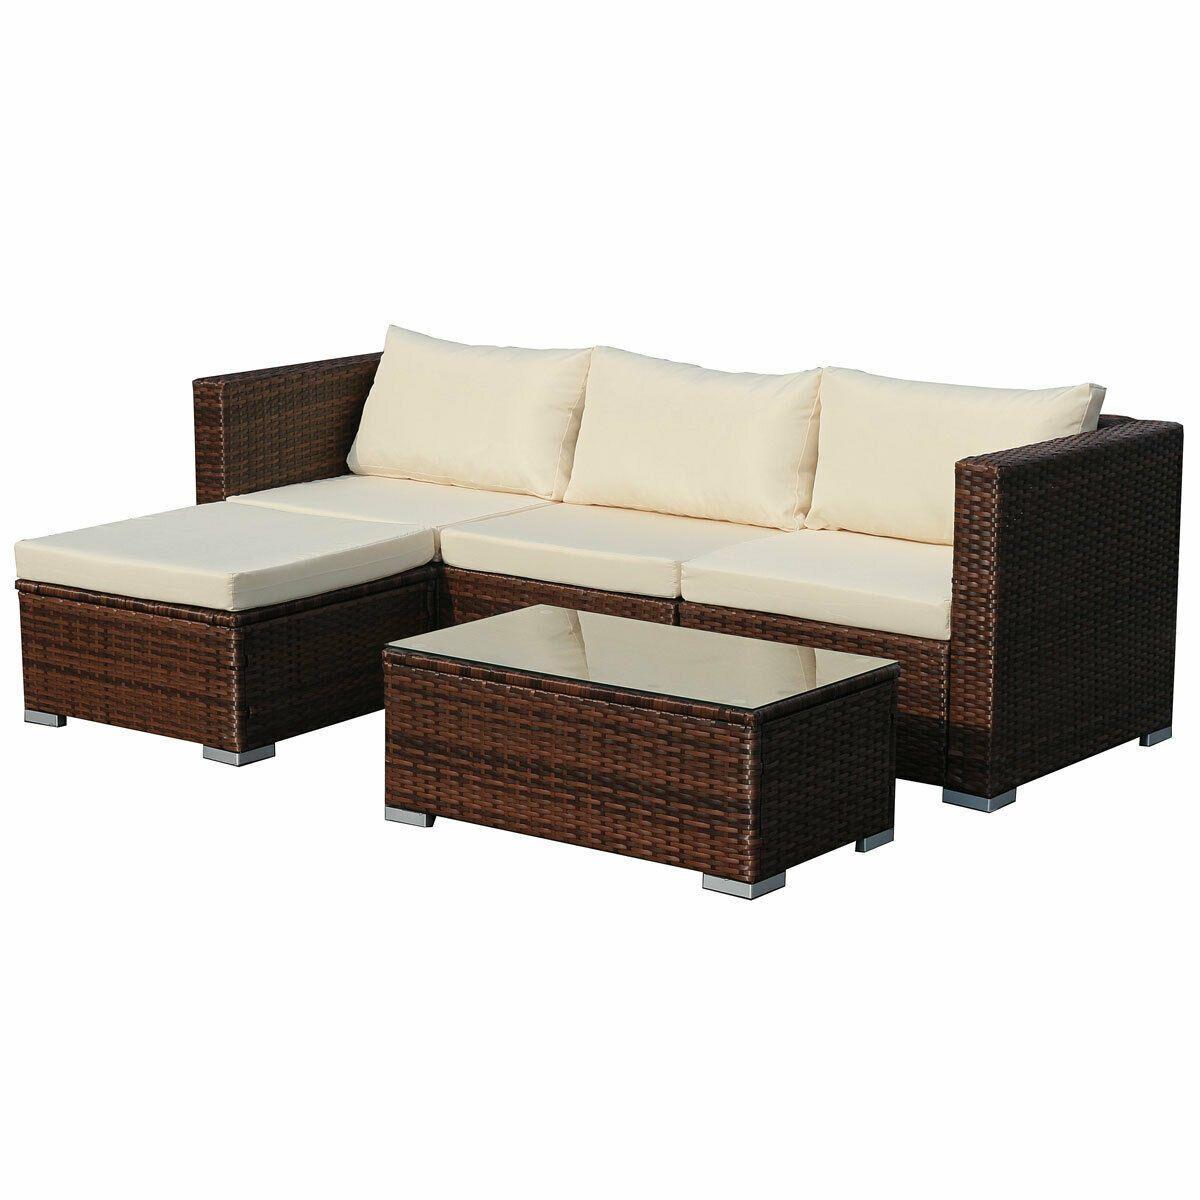 Lounge Sofa Gartenmöbel